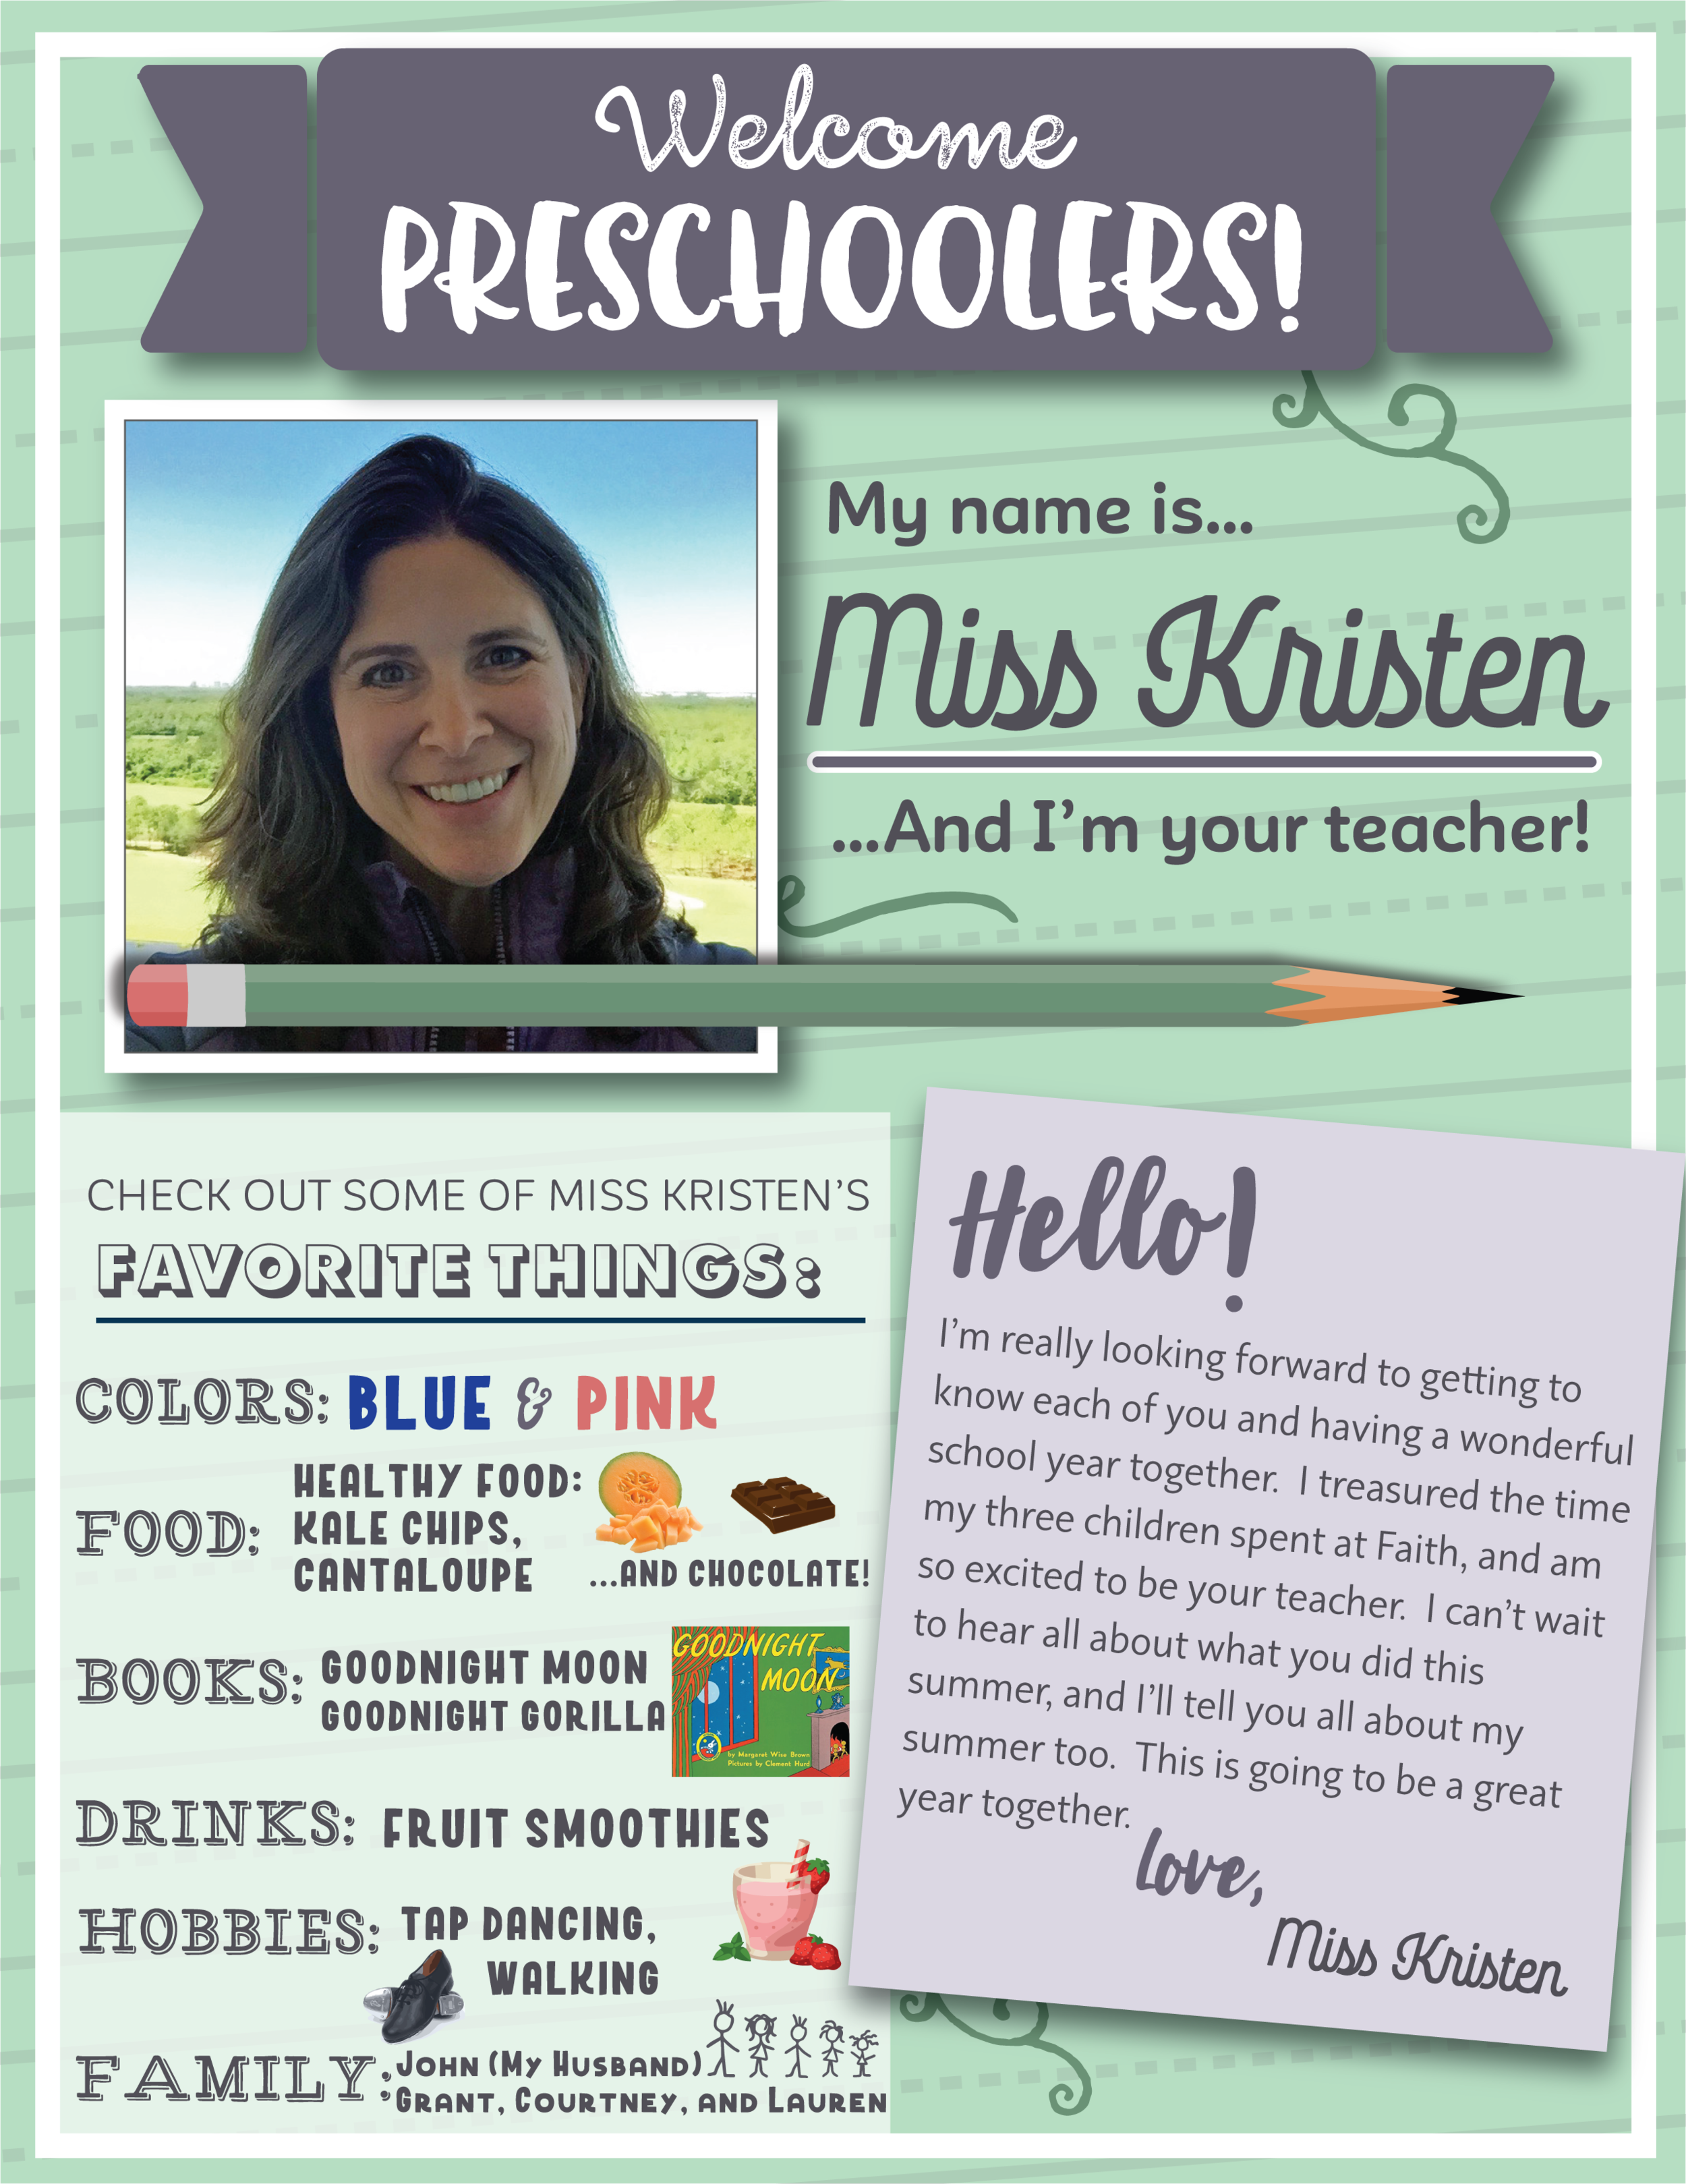 faith preschool - teachers_kristen intro.png